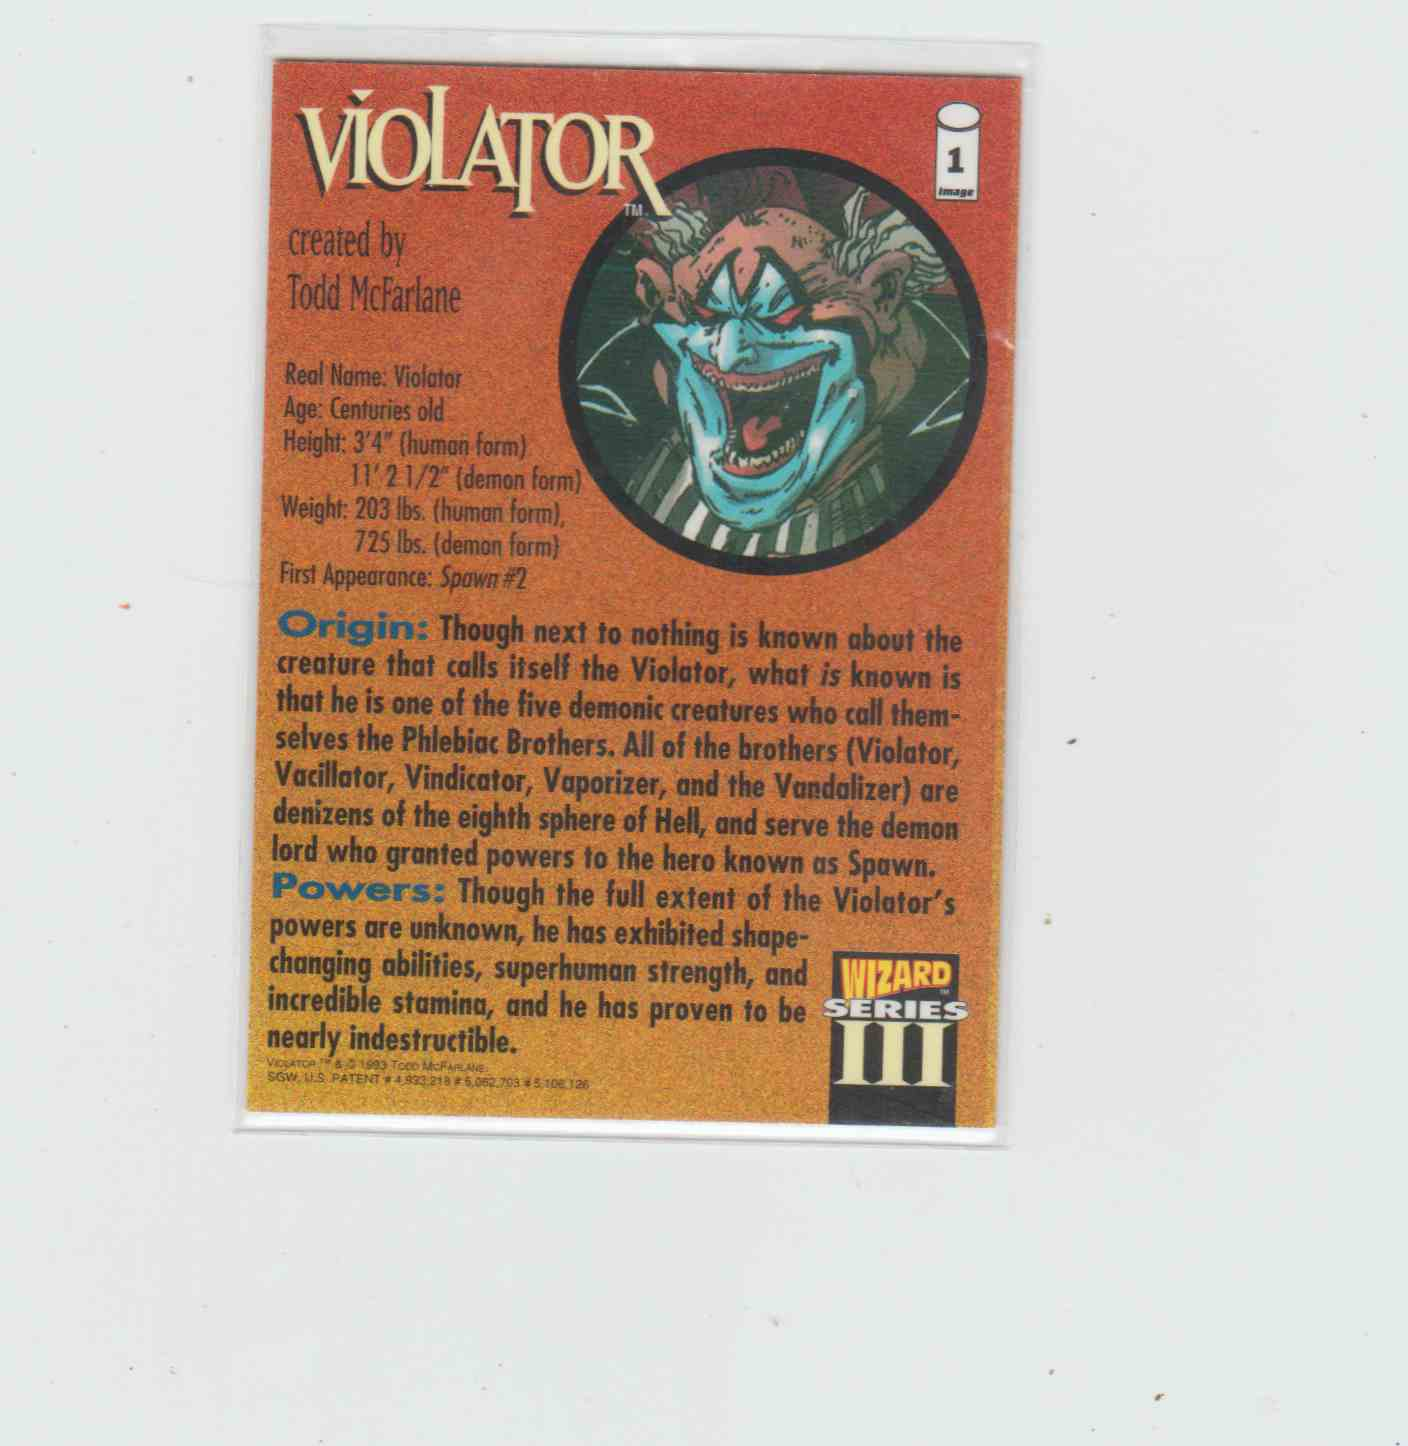 1993 Wizard Series III Todd McFarlane Violator #1 card back image